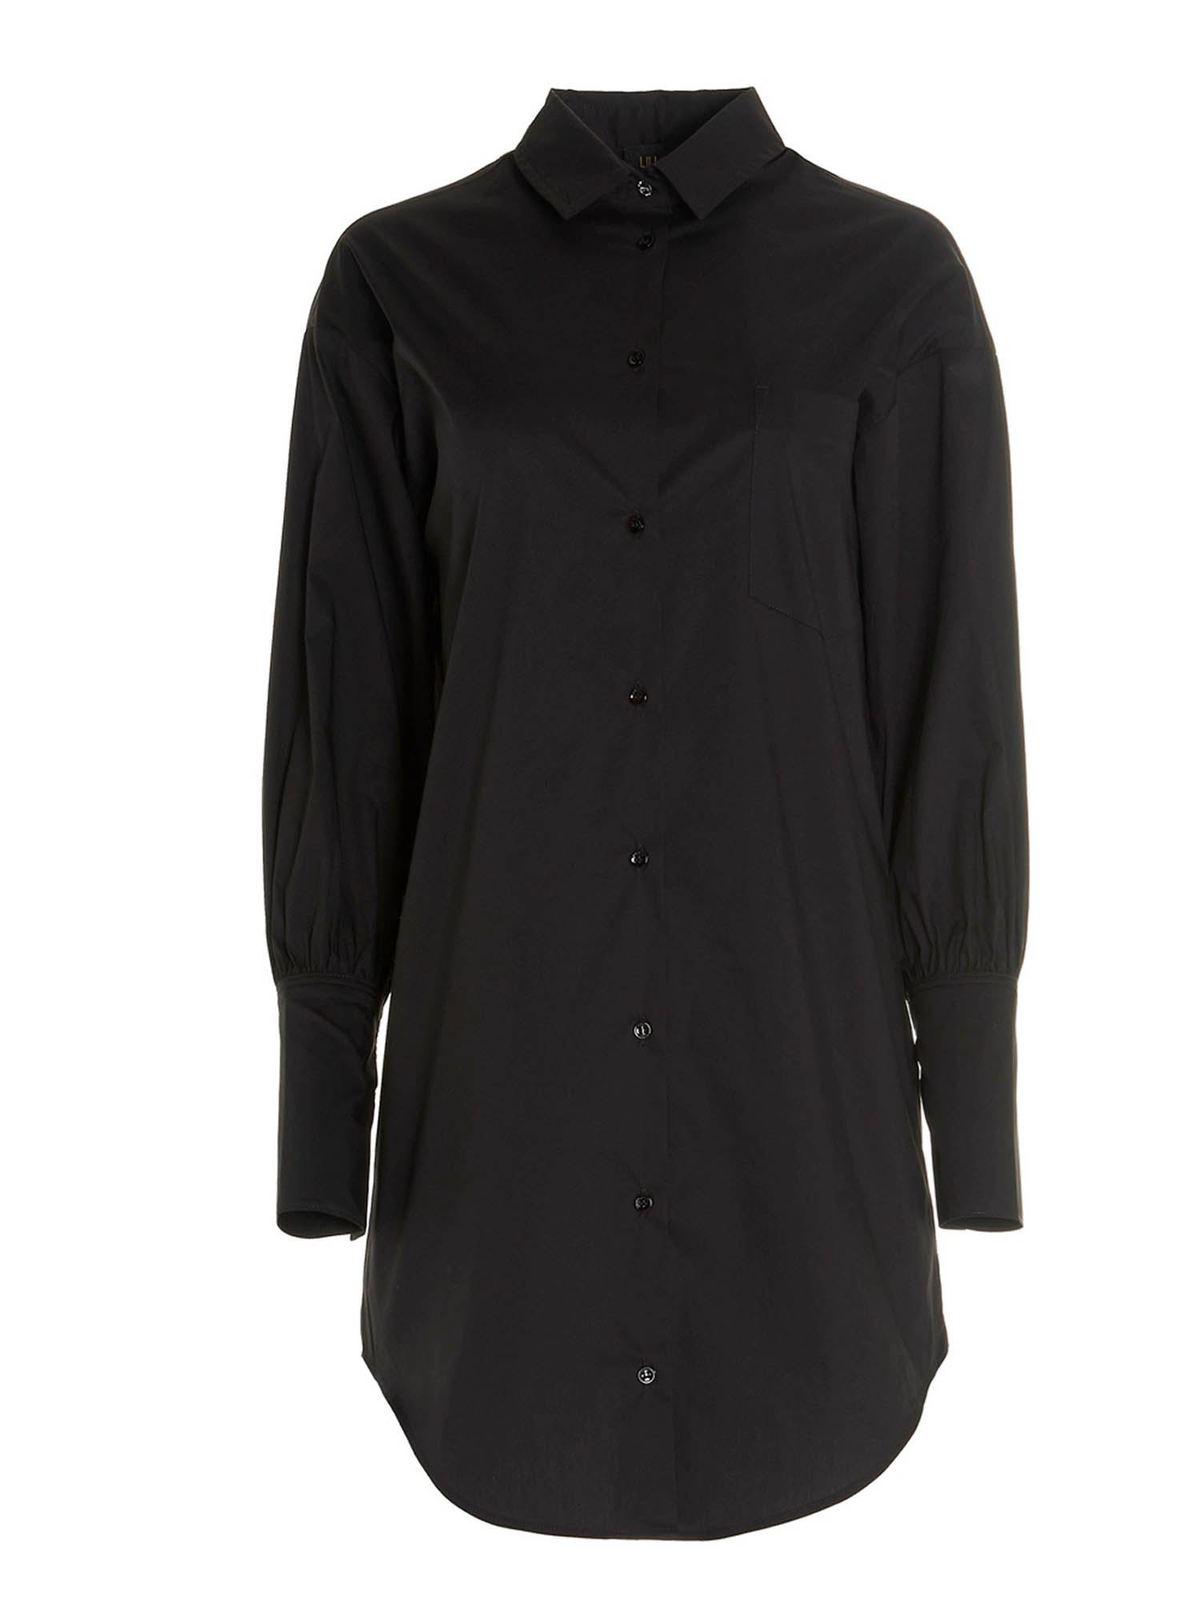 Liu •jo Cottons SHIRT DRESS IN BLACK